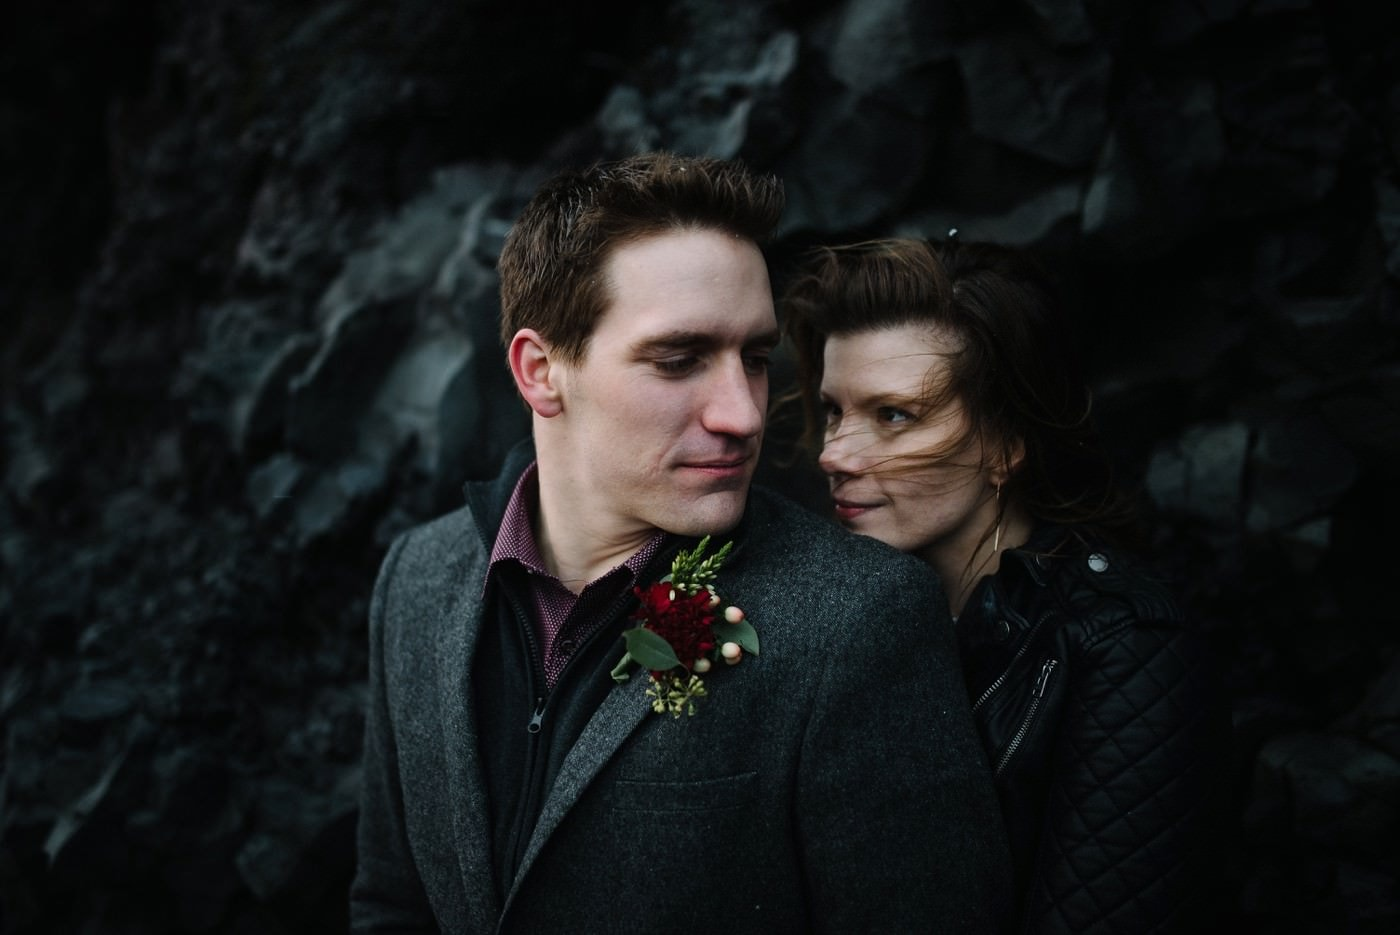 iceland-wedding-photographer-advenuture-elopement-iceland-photography_0101